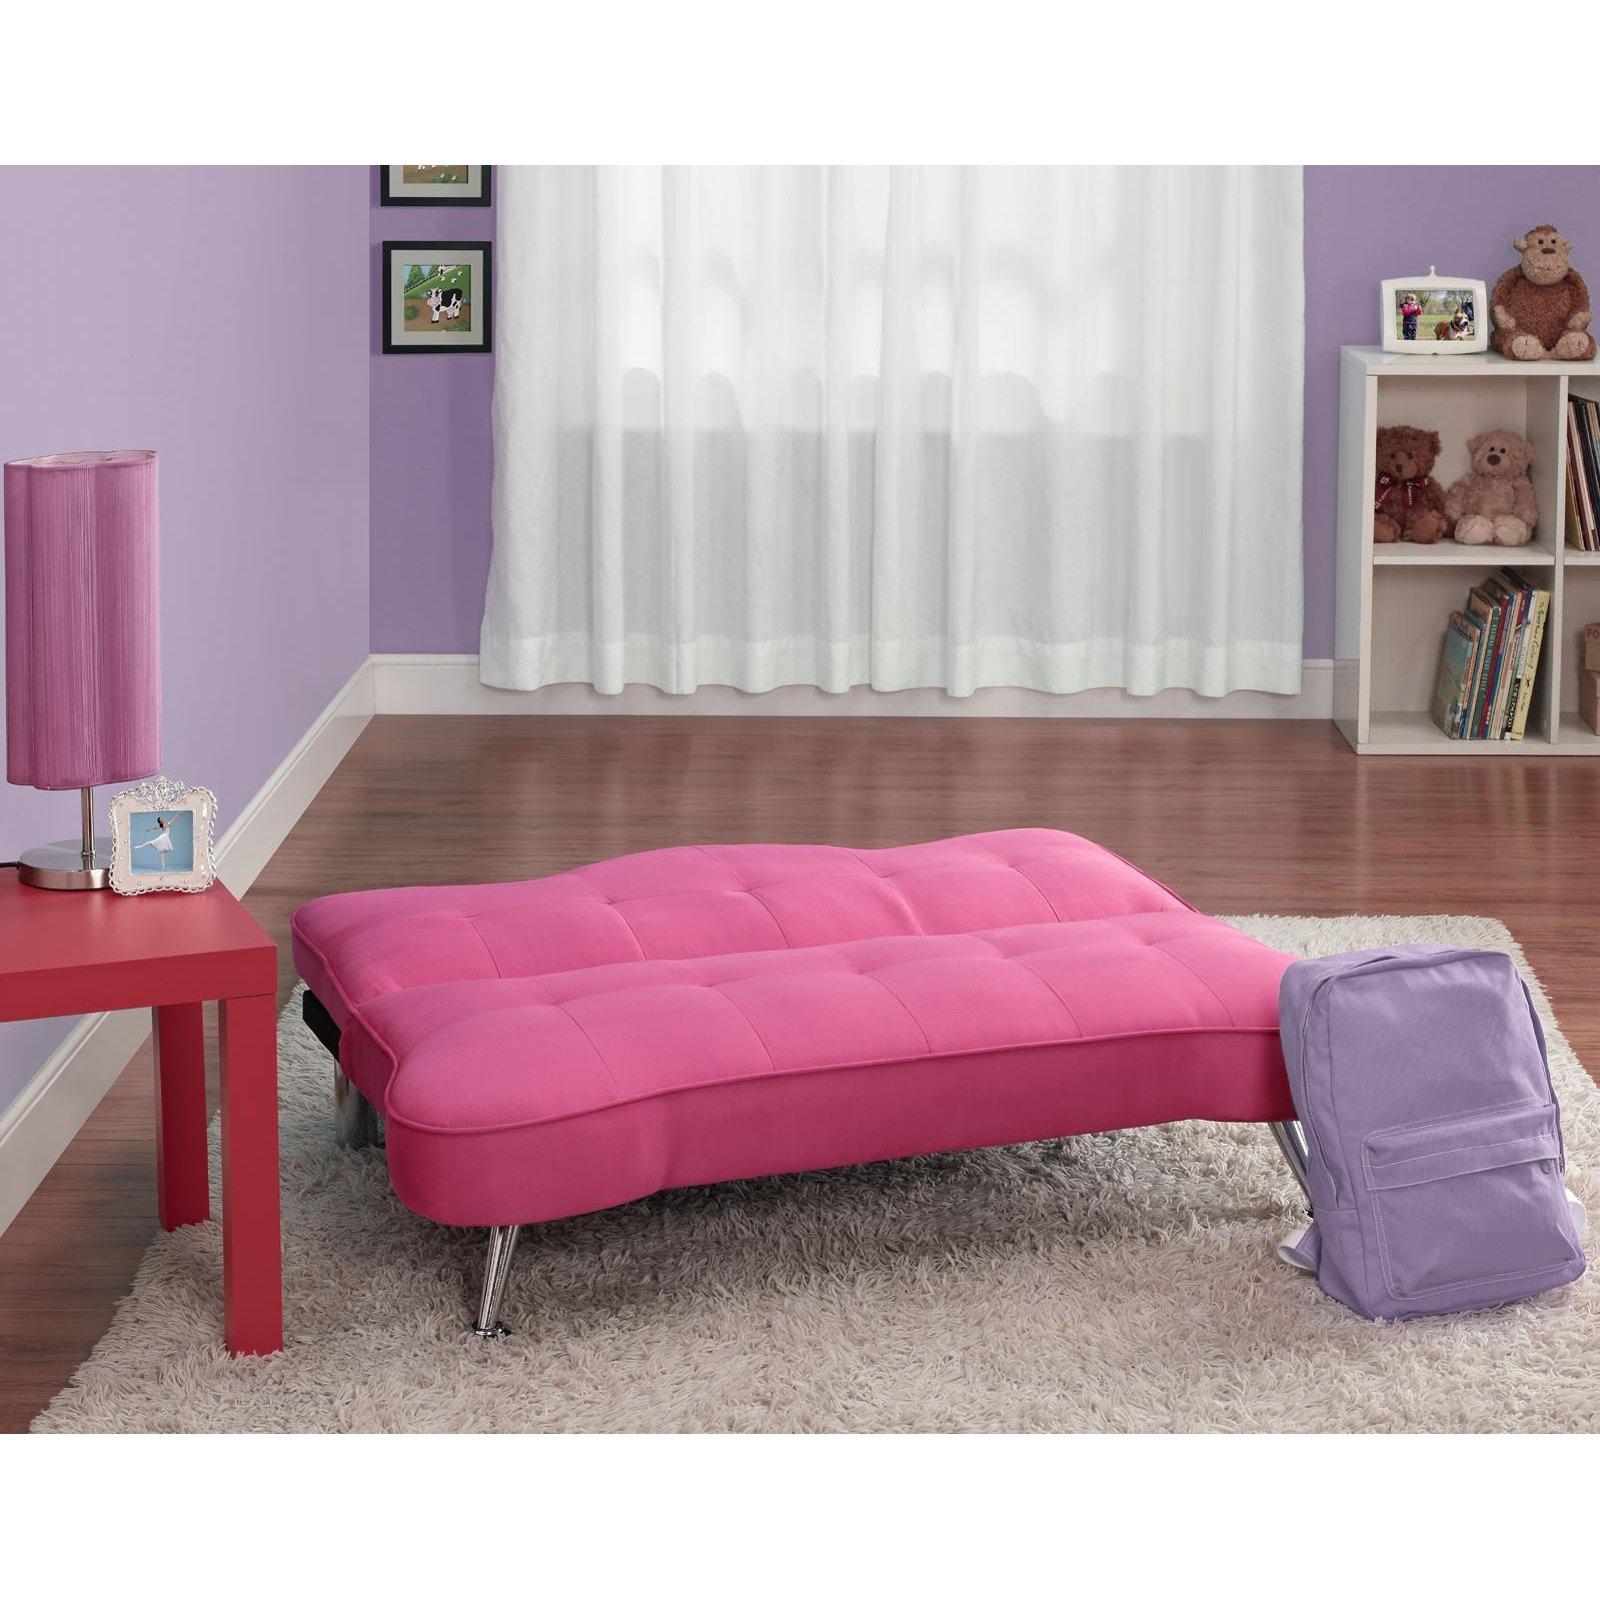 DHP Rose Junior Sofa Lounger Racy Pink Walmart